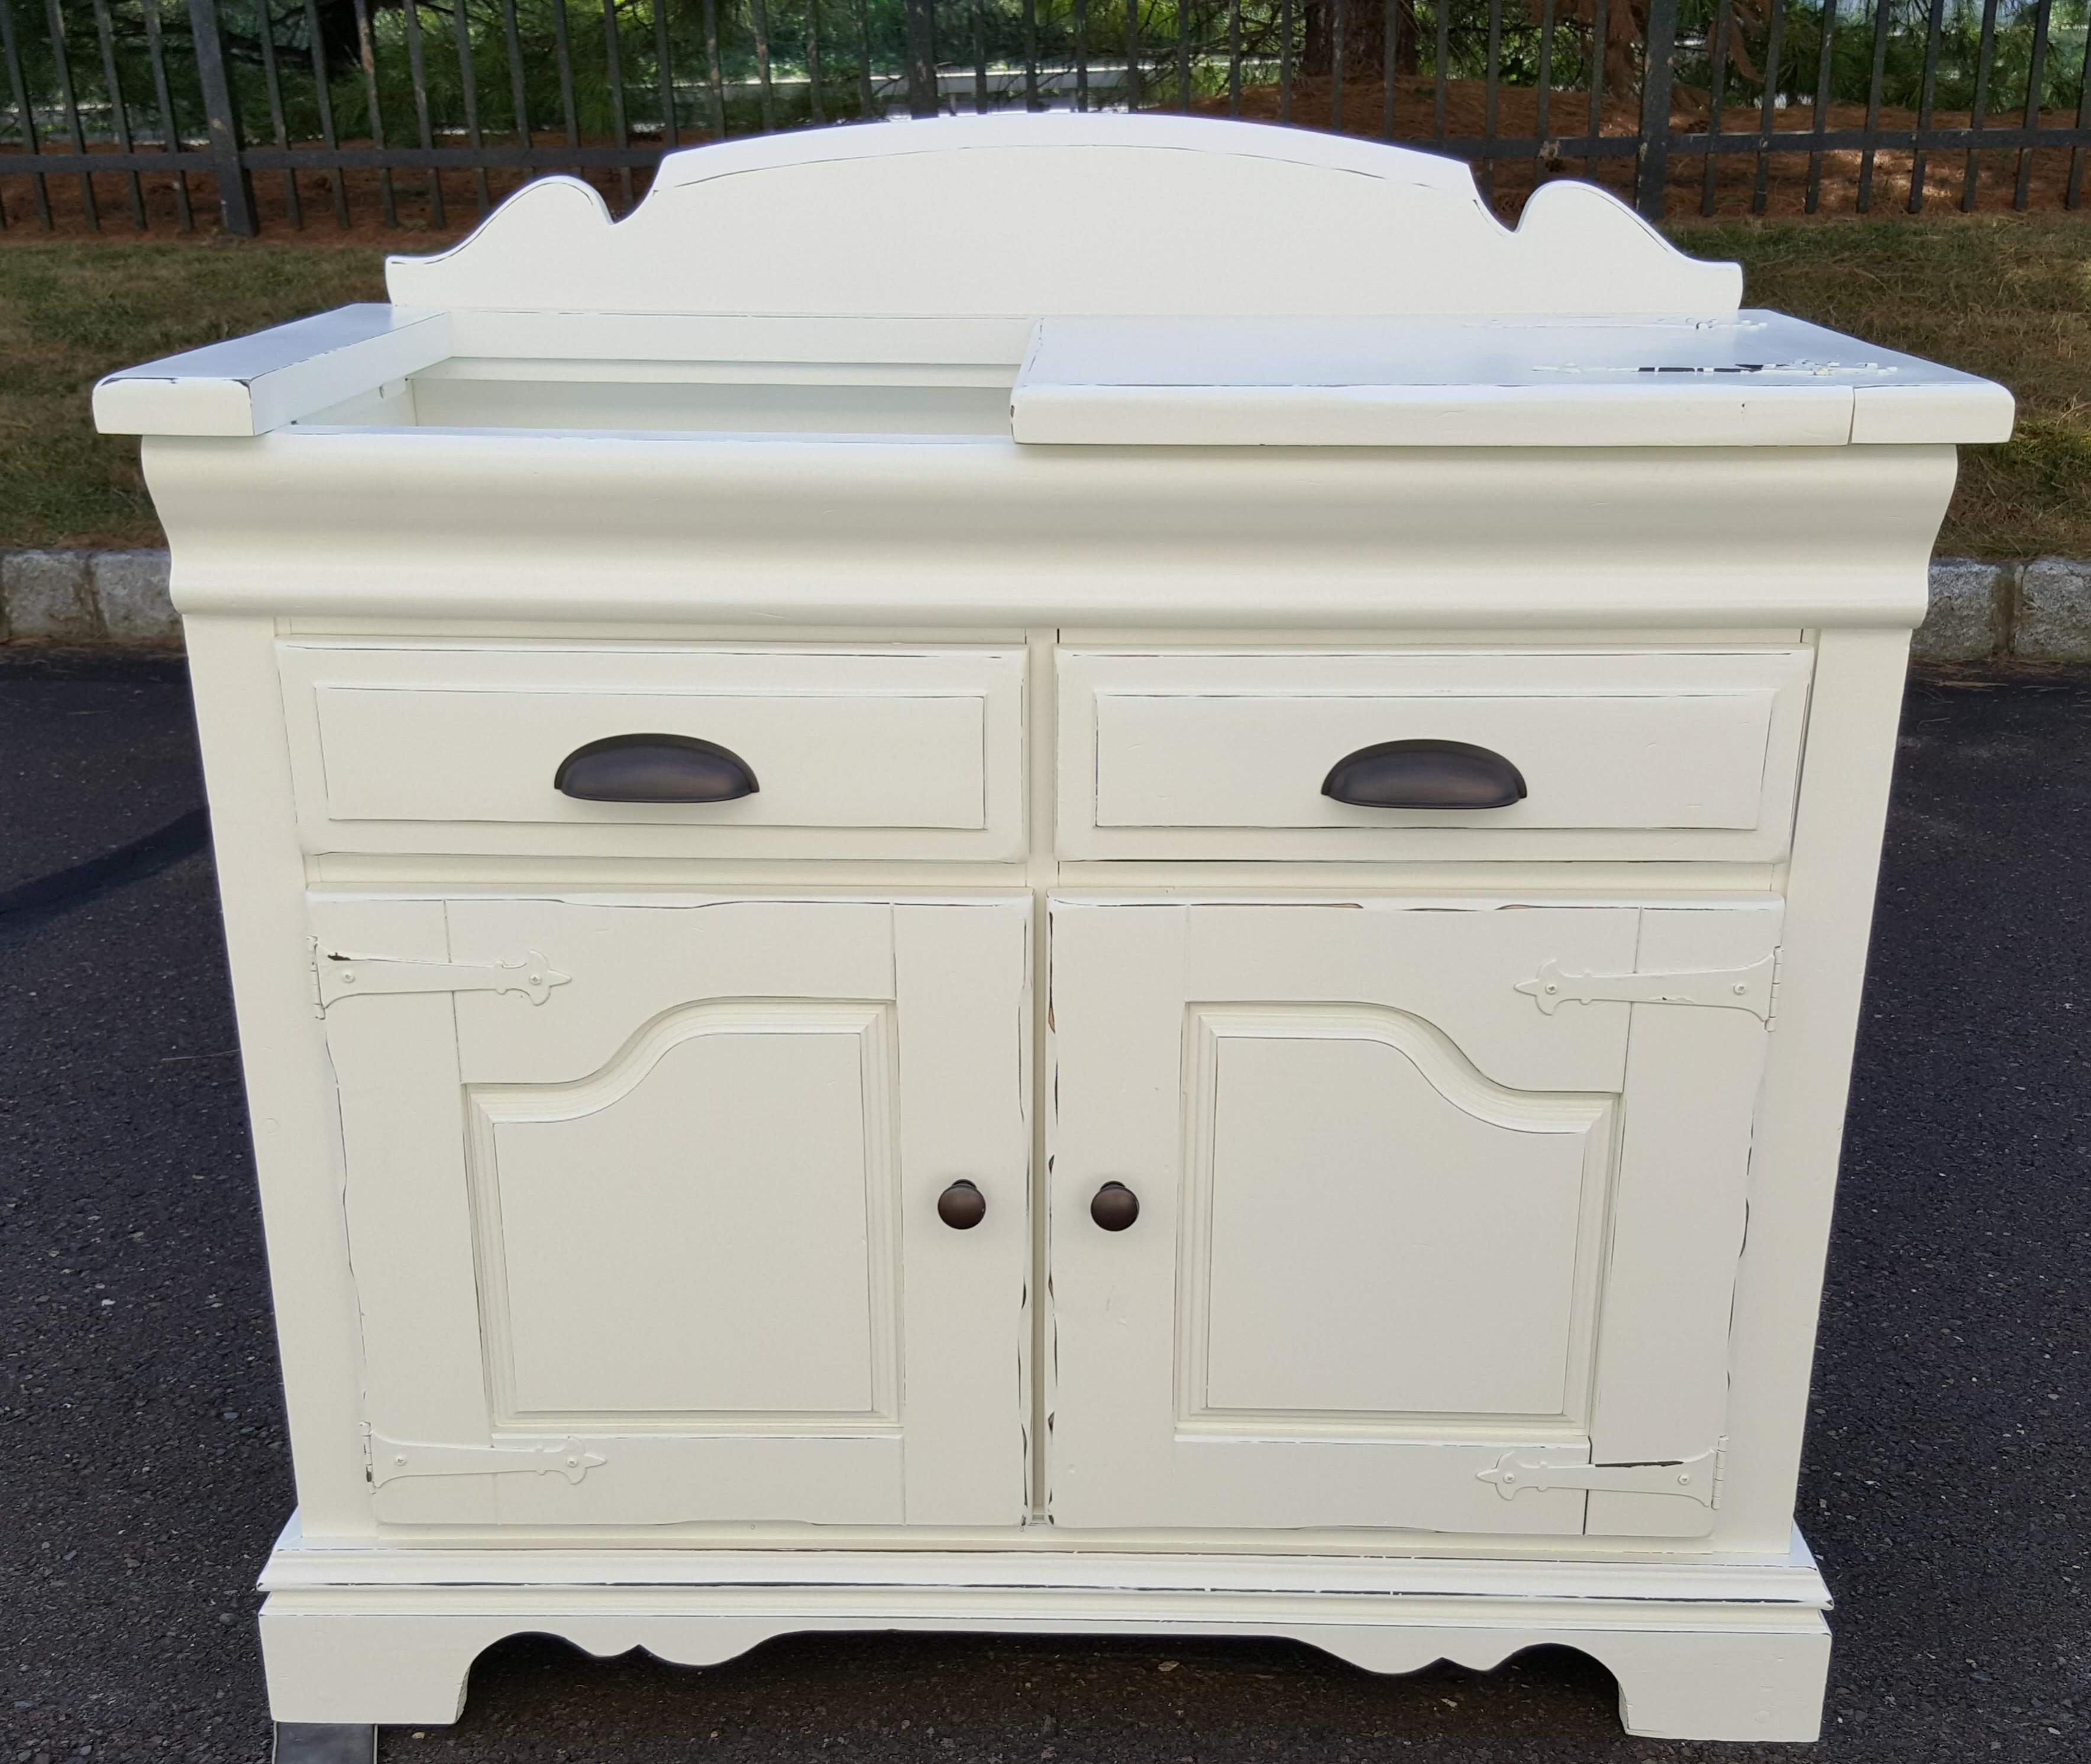 Sold Vintage Cabinet storage bookcase linen closet display cottage chic distressed Alabaster white